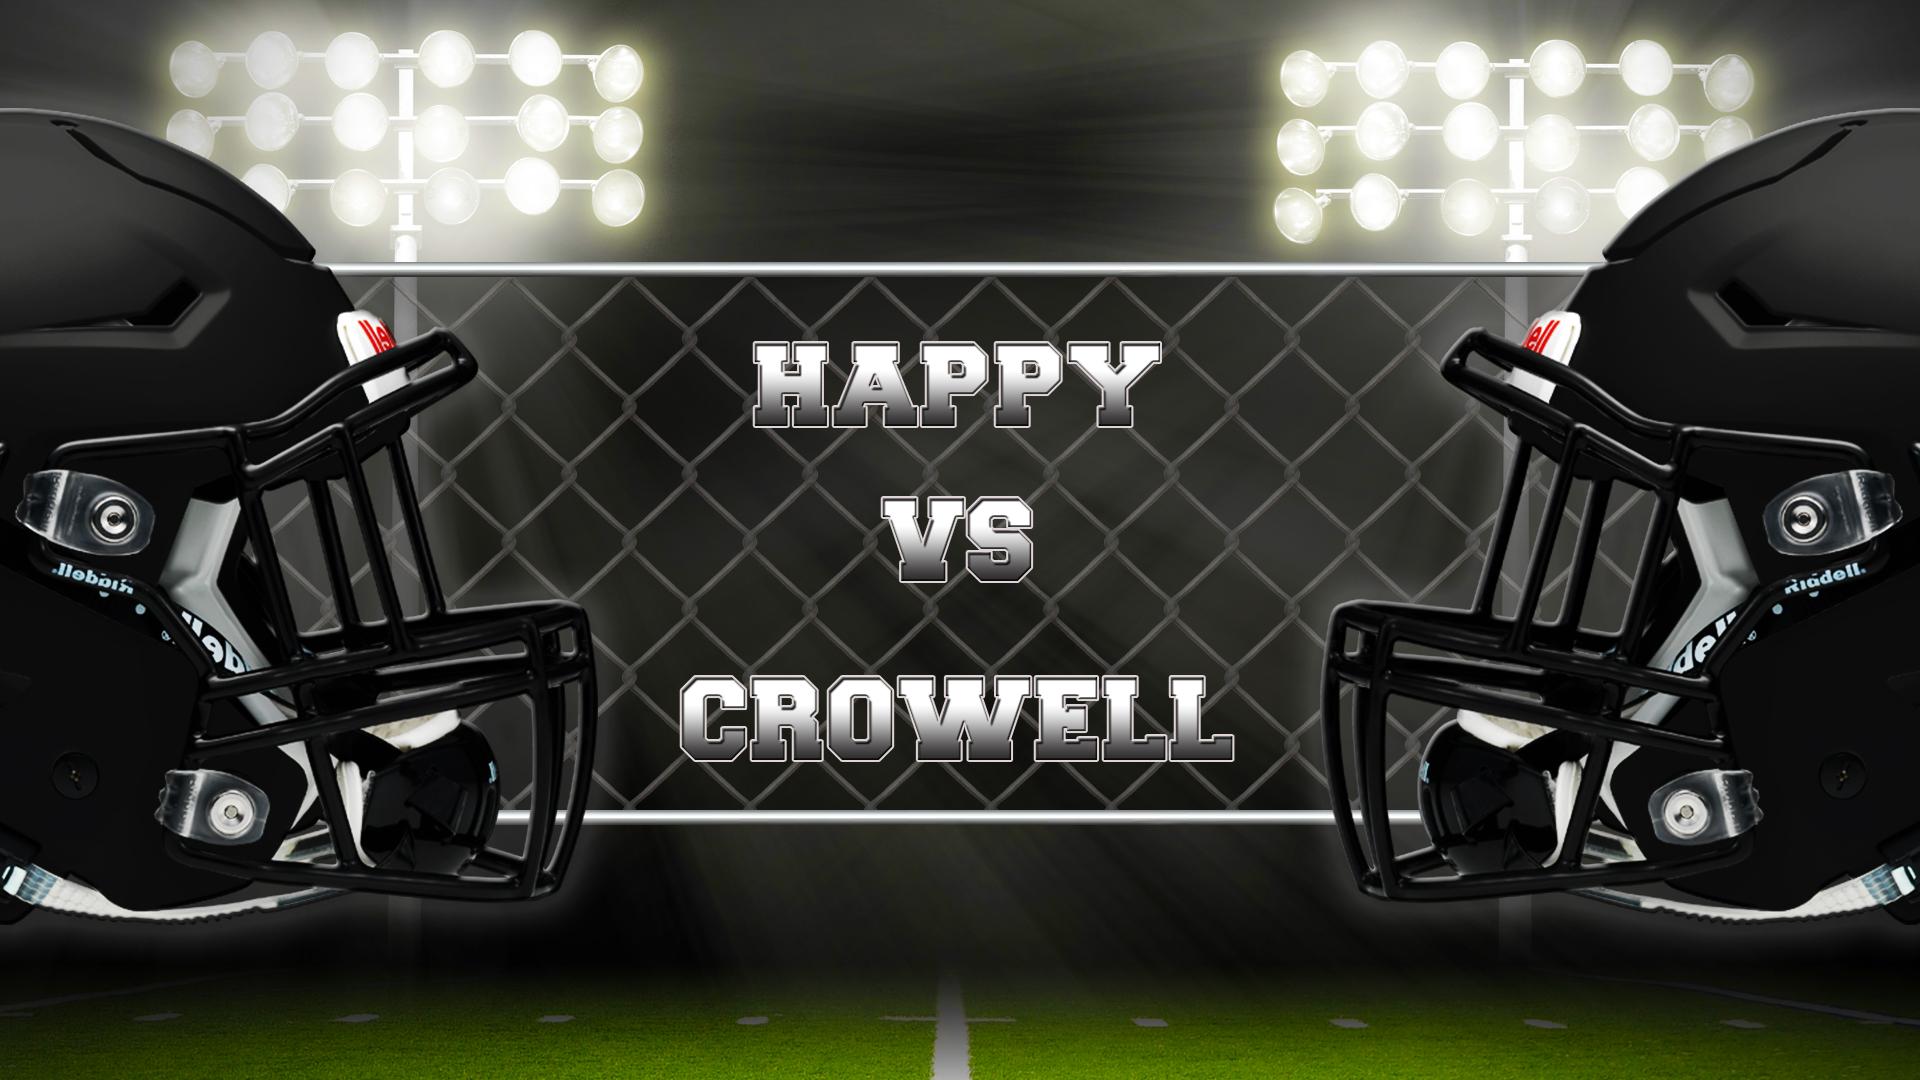 Happy vs Crowell_1474641838469.jpg